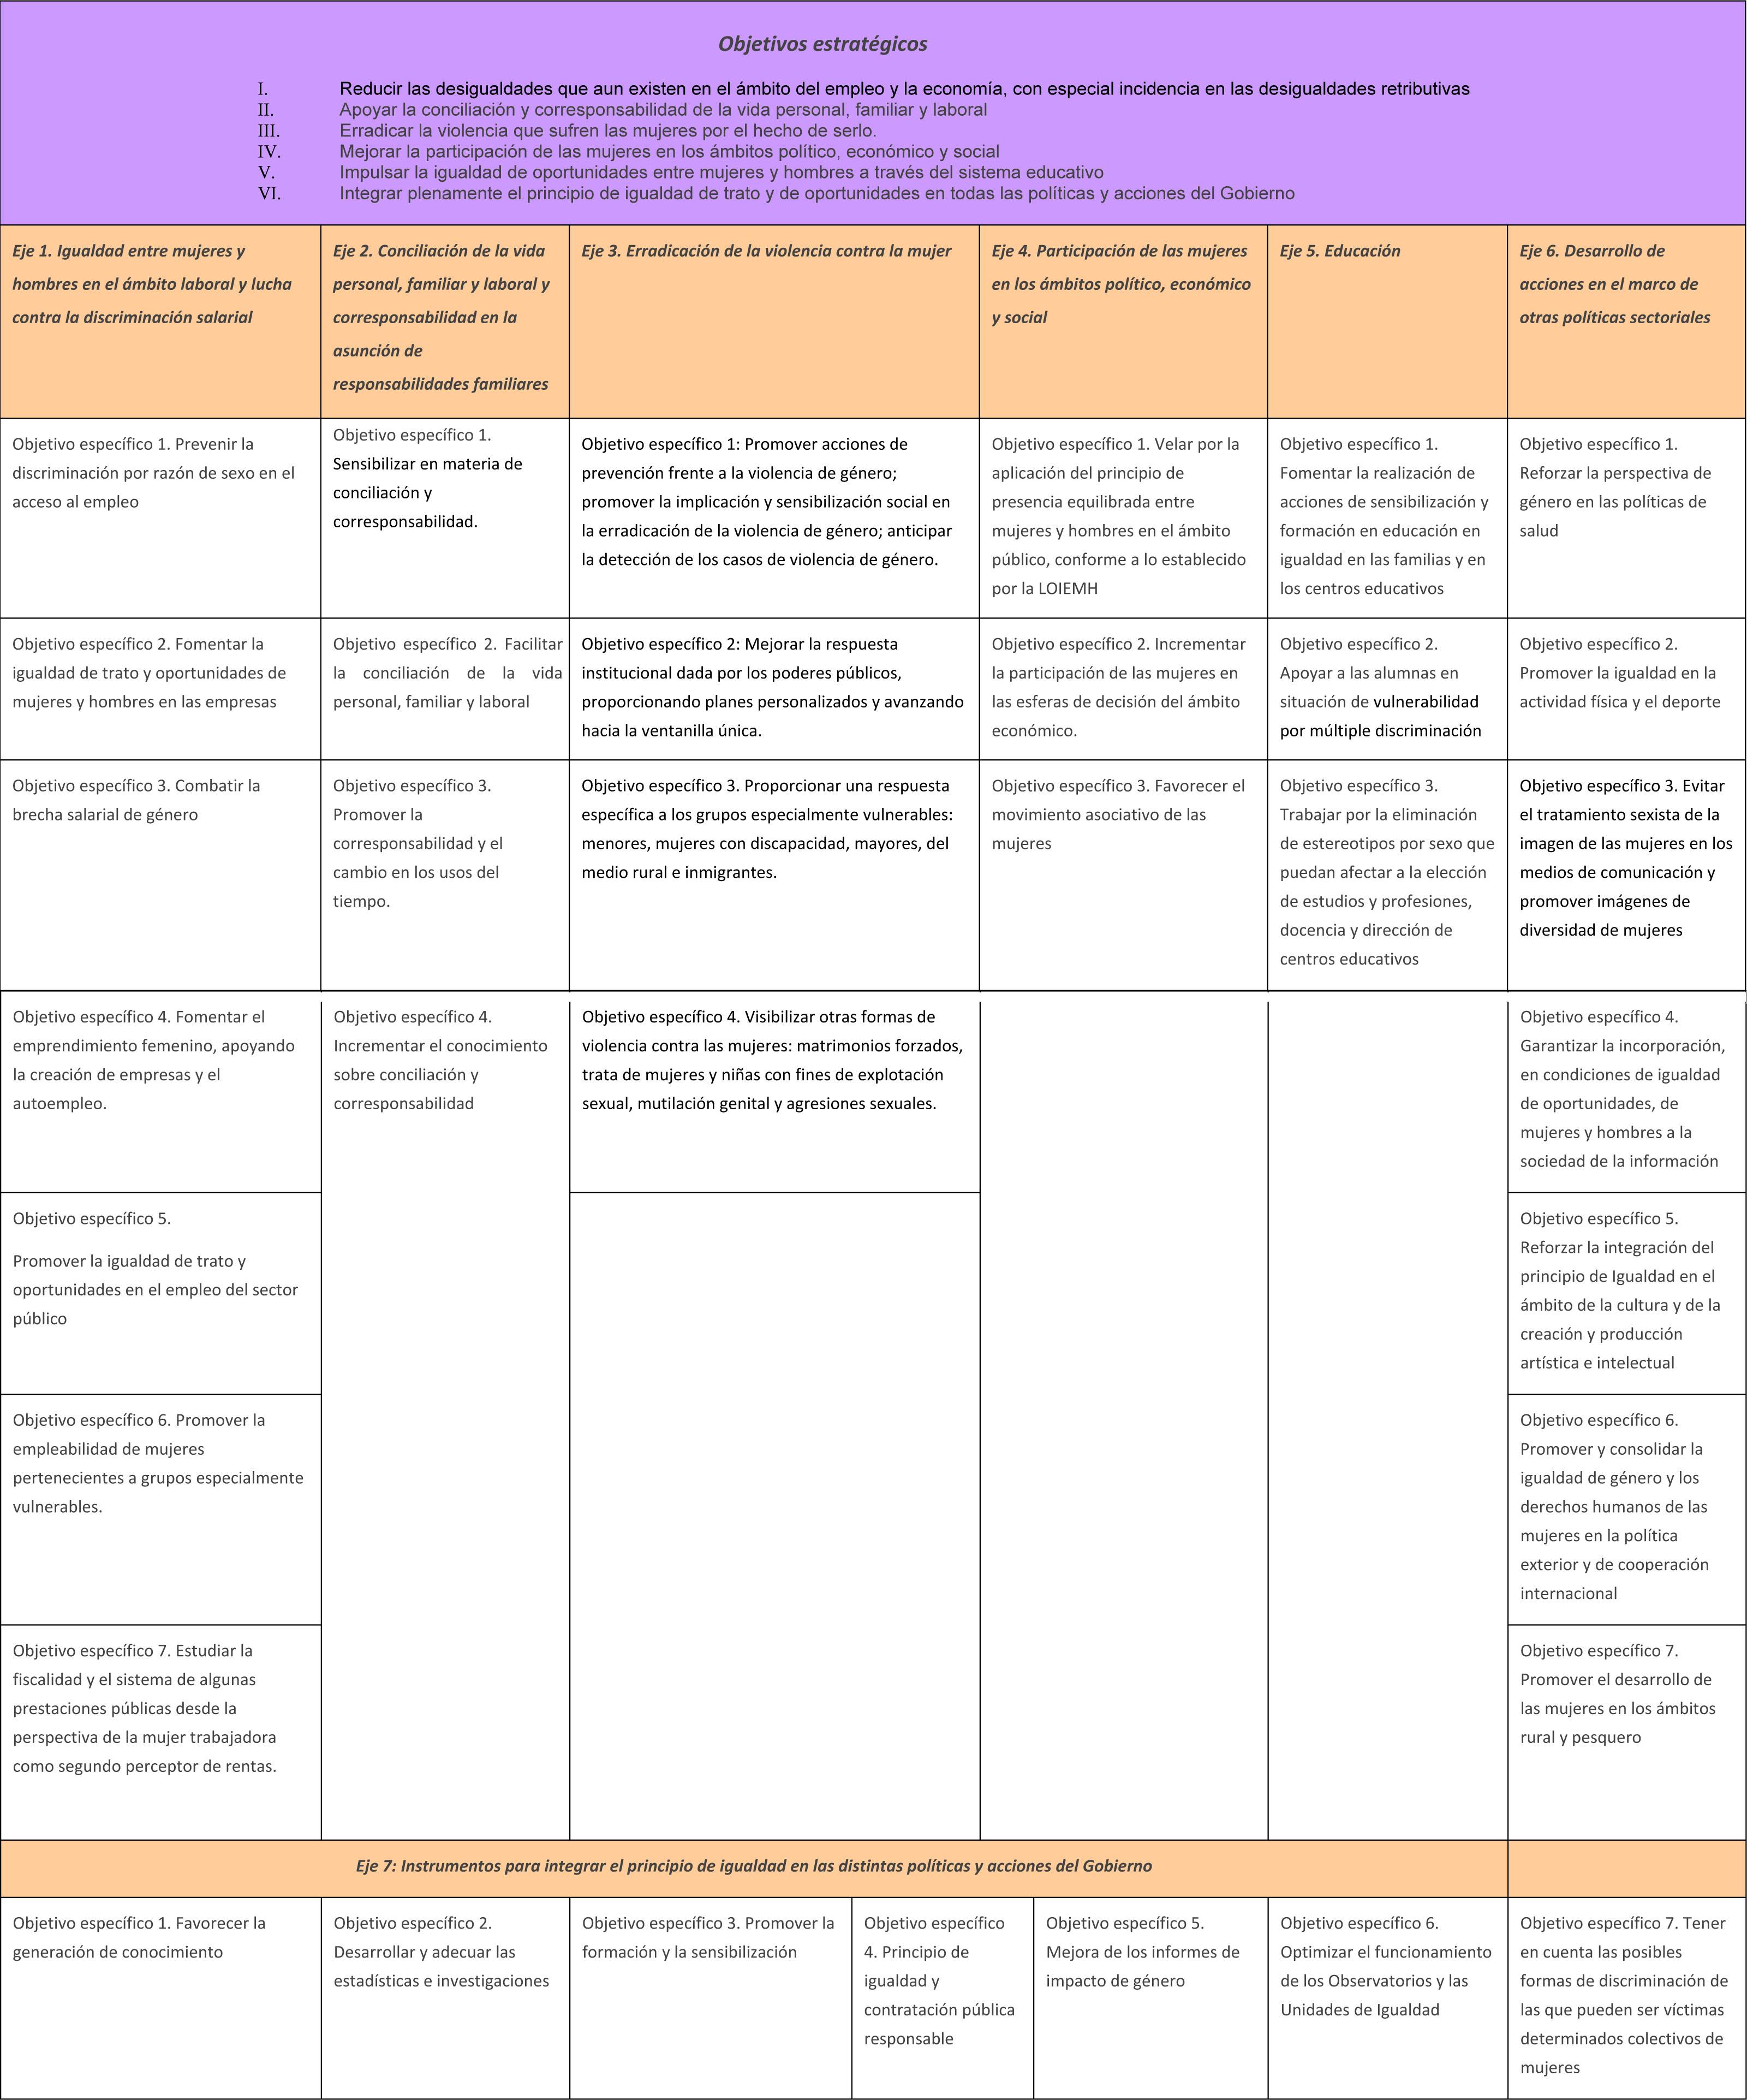 Microsoft Word - PEIO 2014-2016 7 marzo 2014.doc